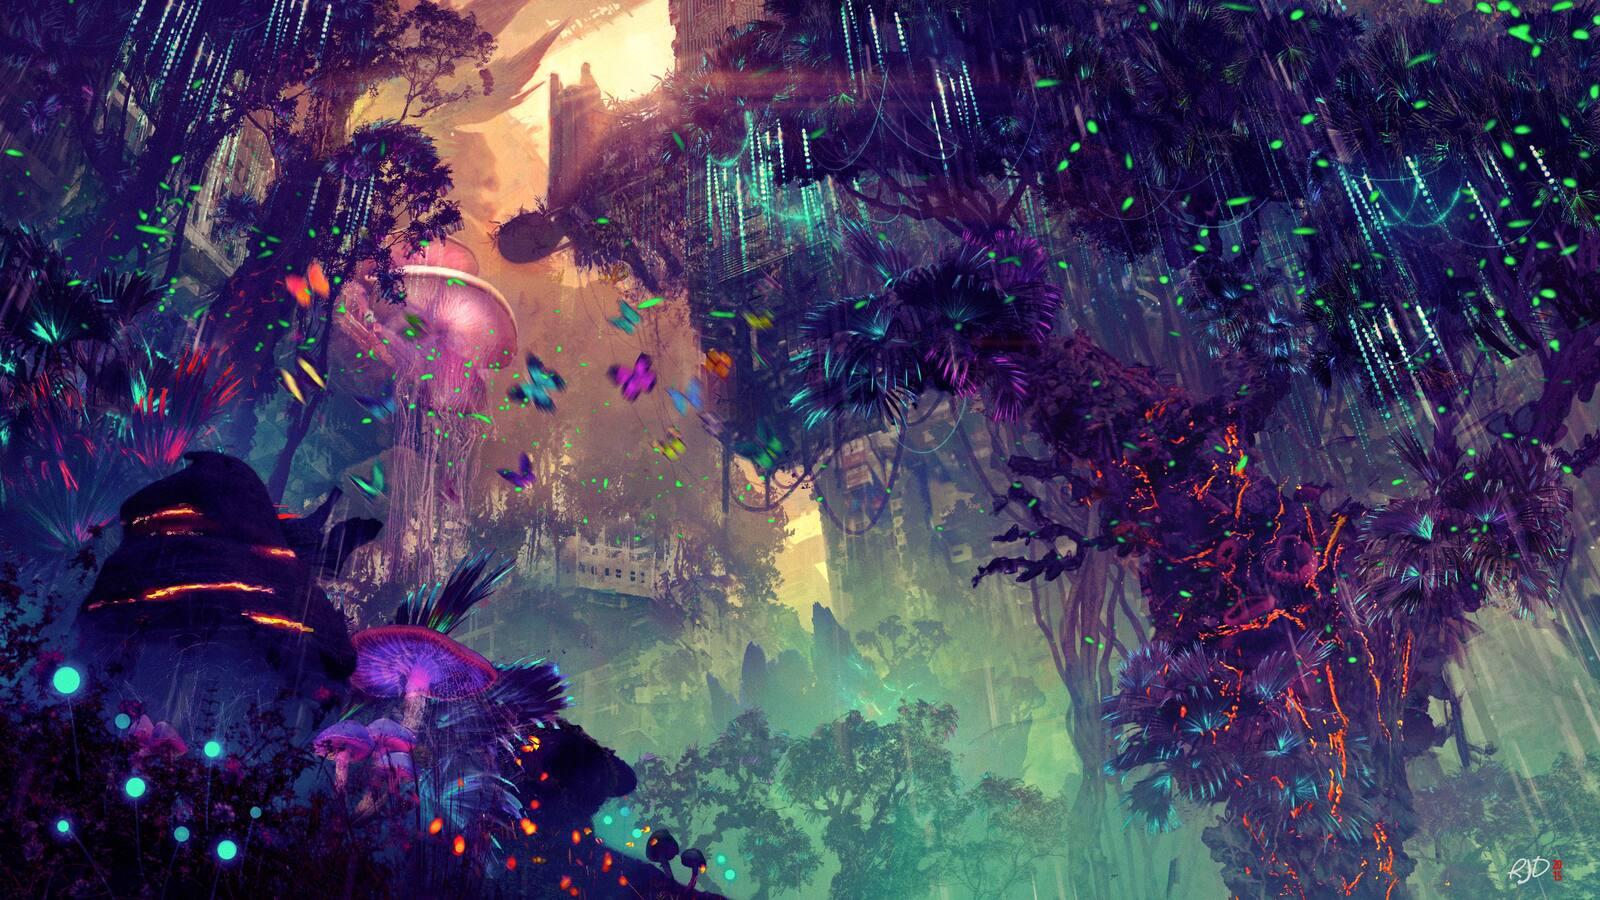 glowing-forest-colorful-digital-drawing-4k-27.jpg